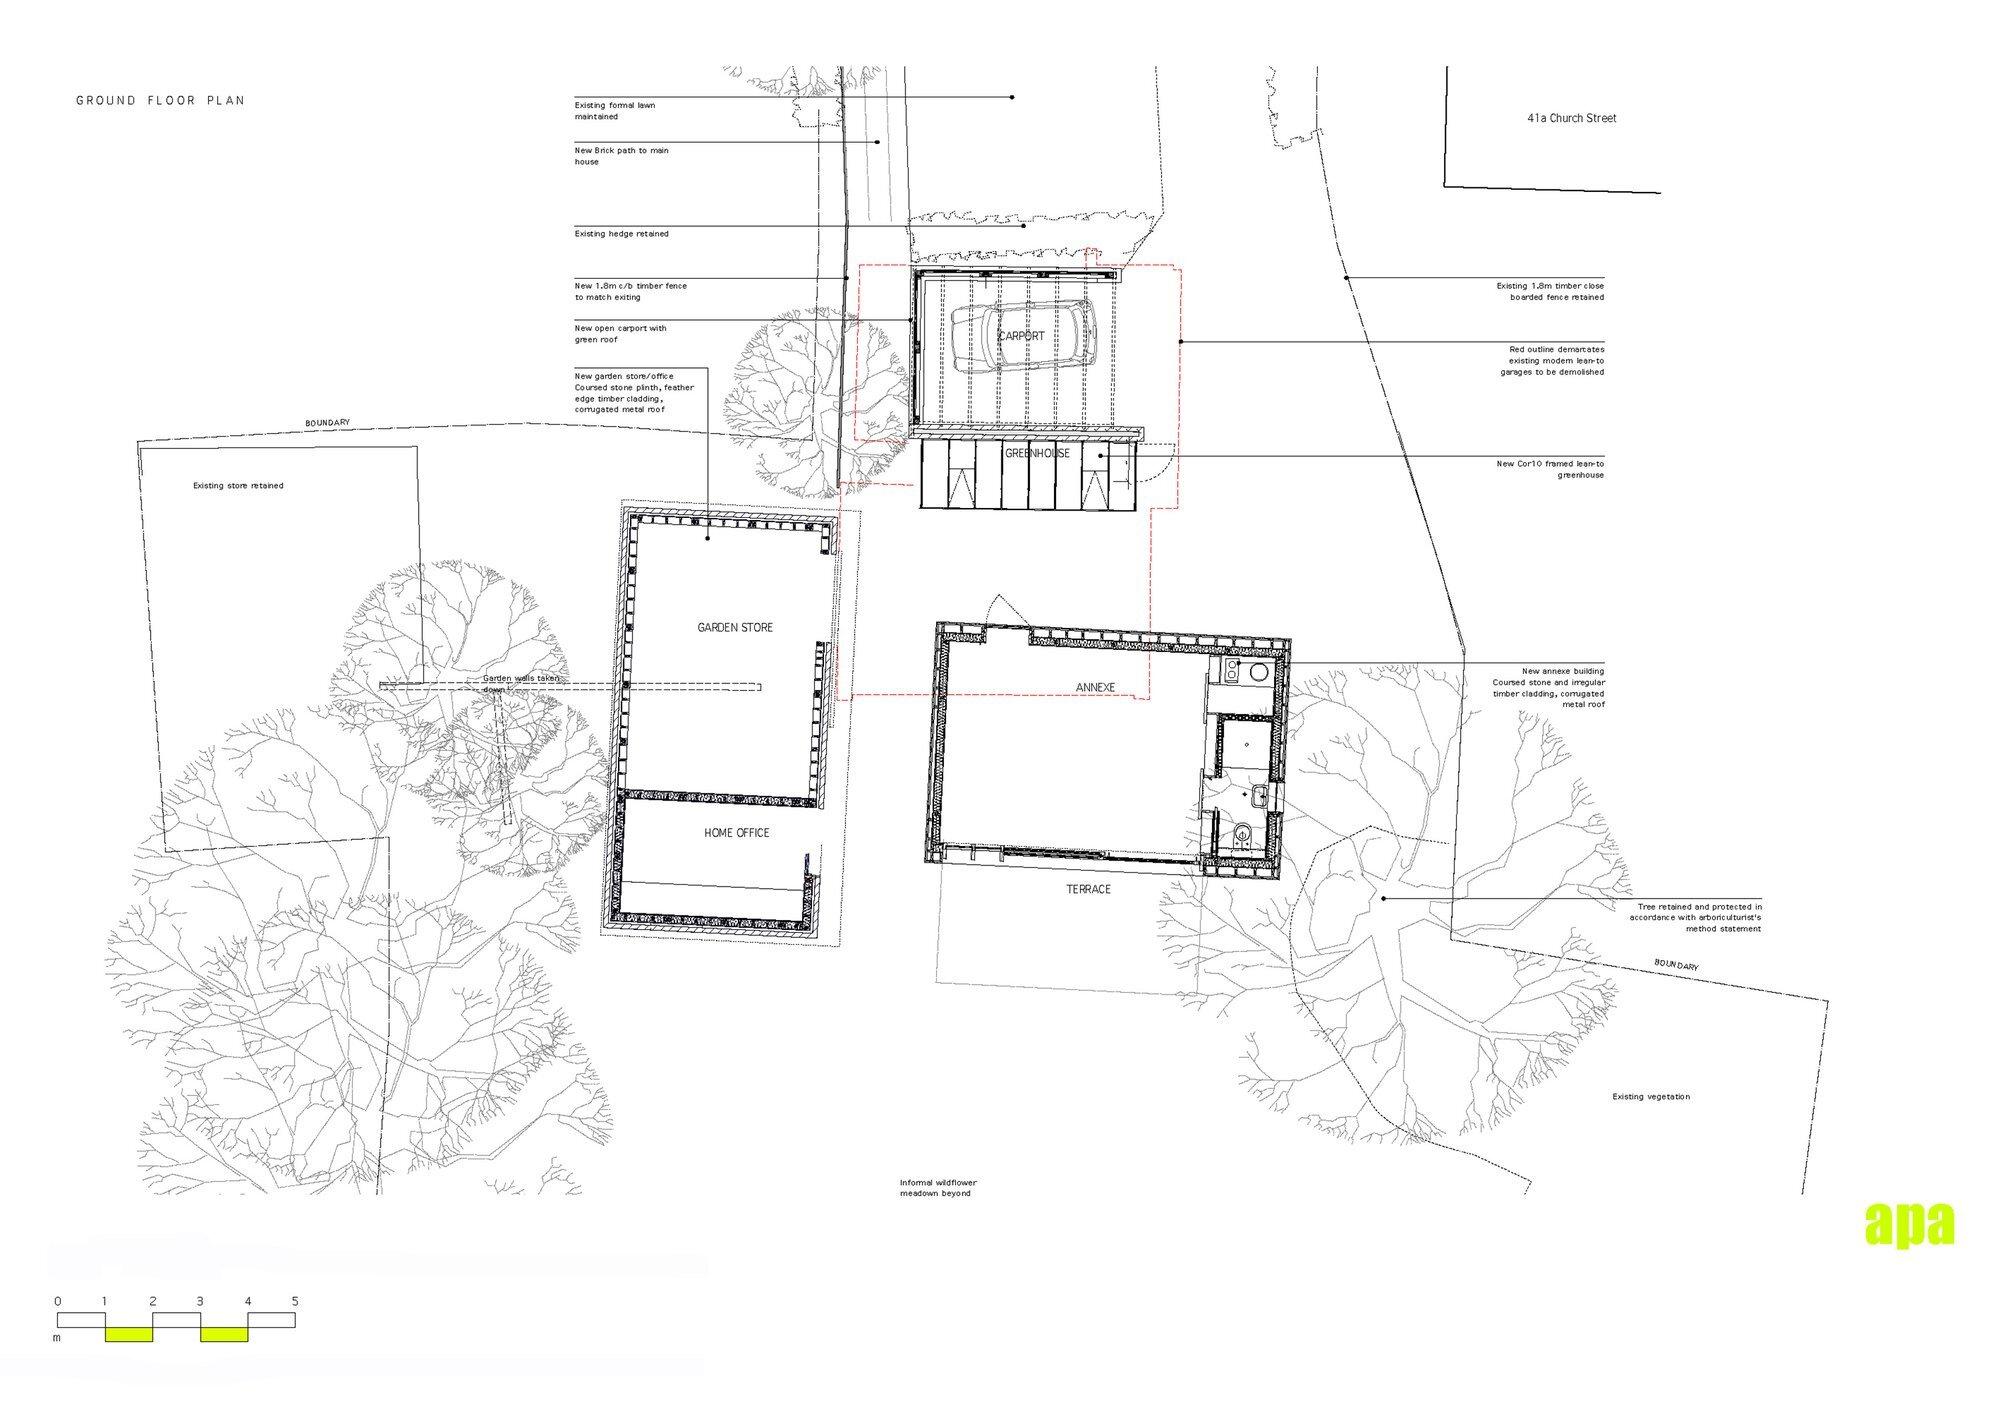 89 Site Plan